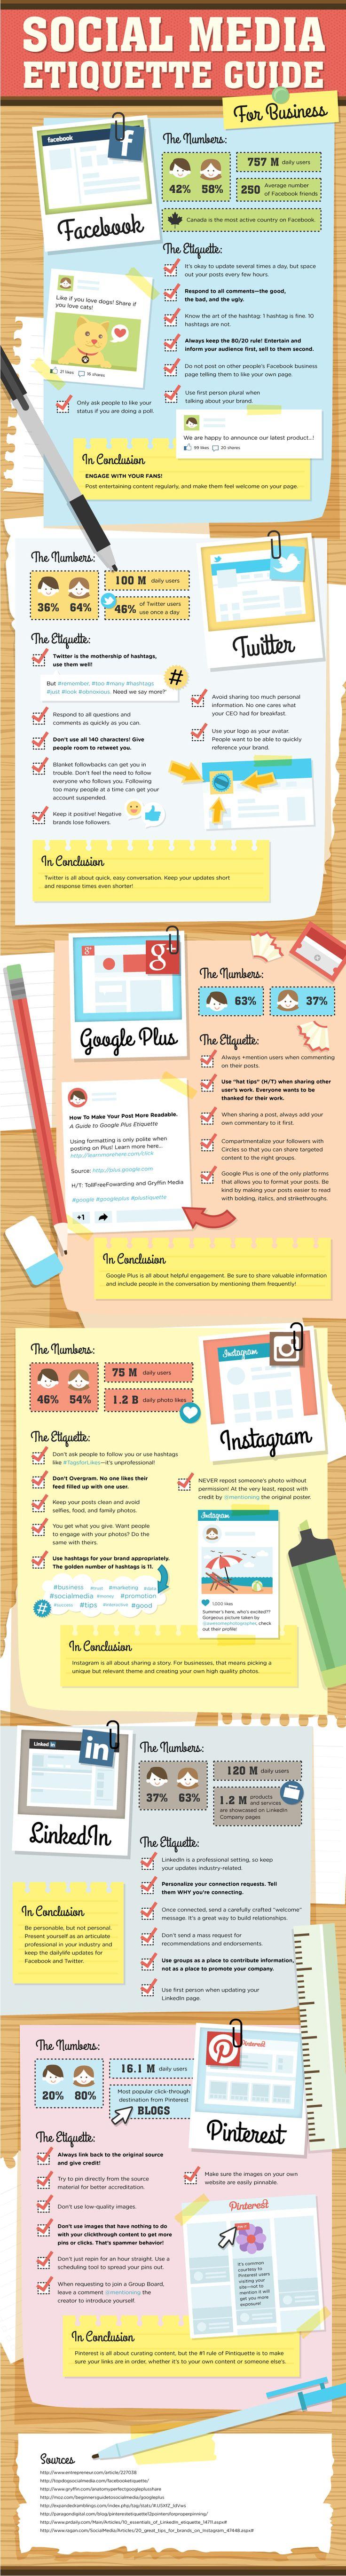 "Infographic: ""Social Media Etiquette Guide"" from Blog Success Journal. SocialMediaEtiquette-IG"